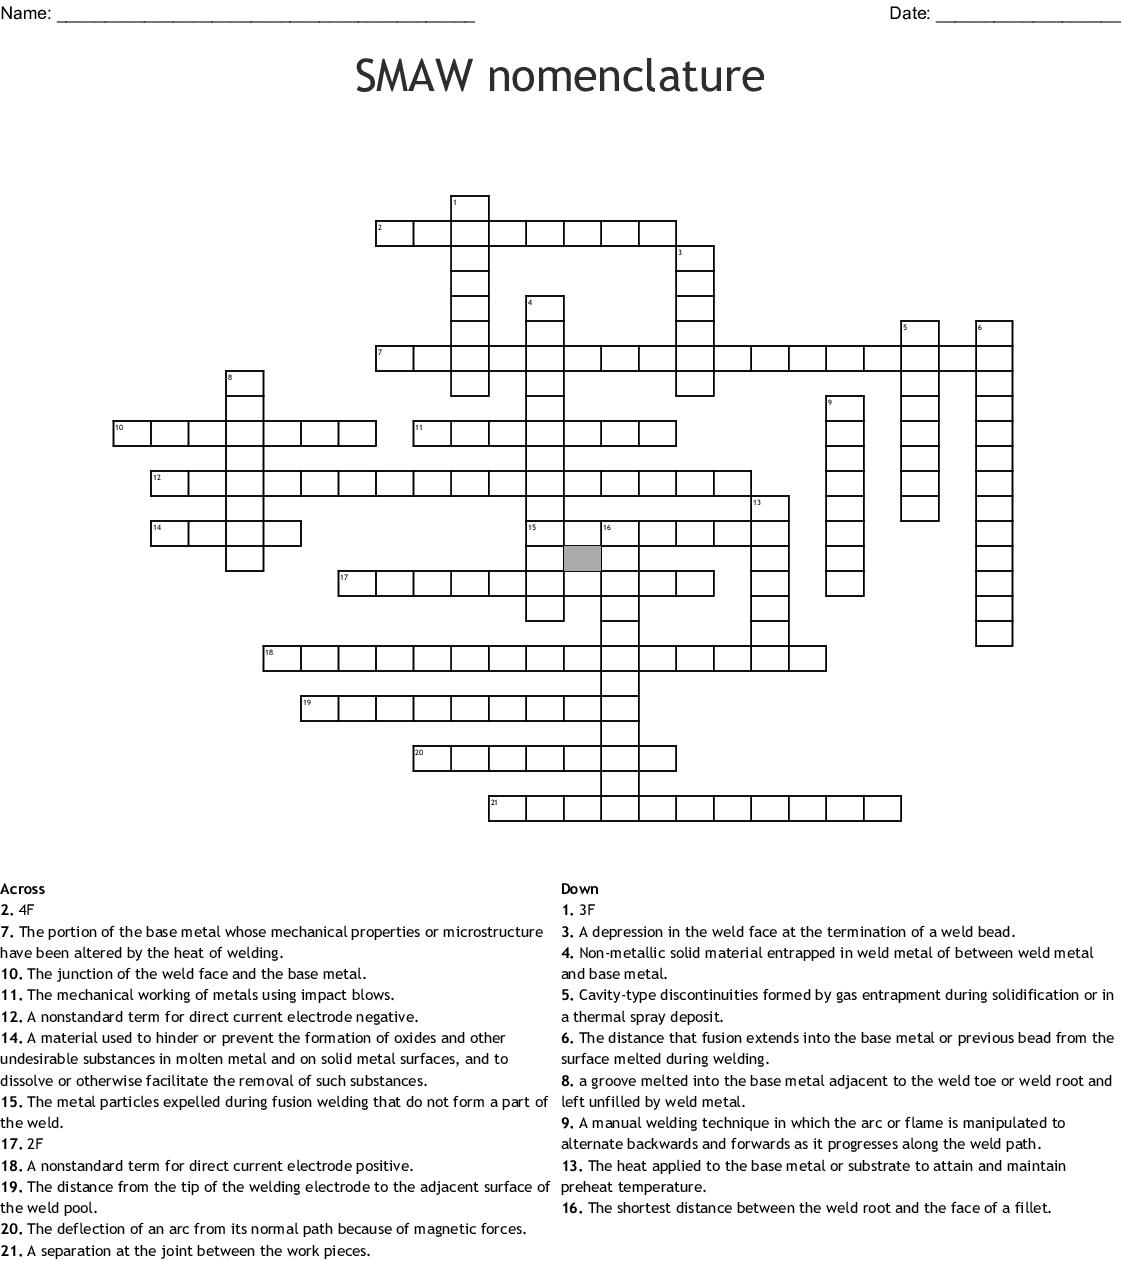 hight resolution of smaw nomenclature crossword